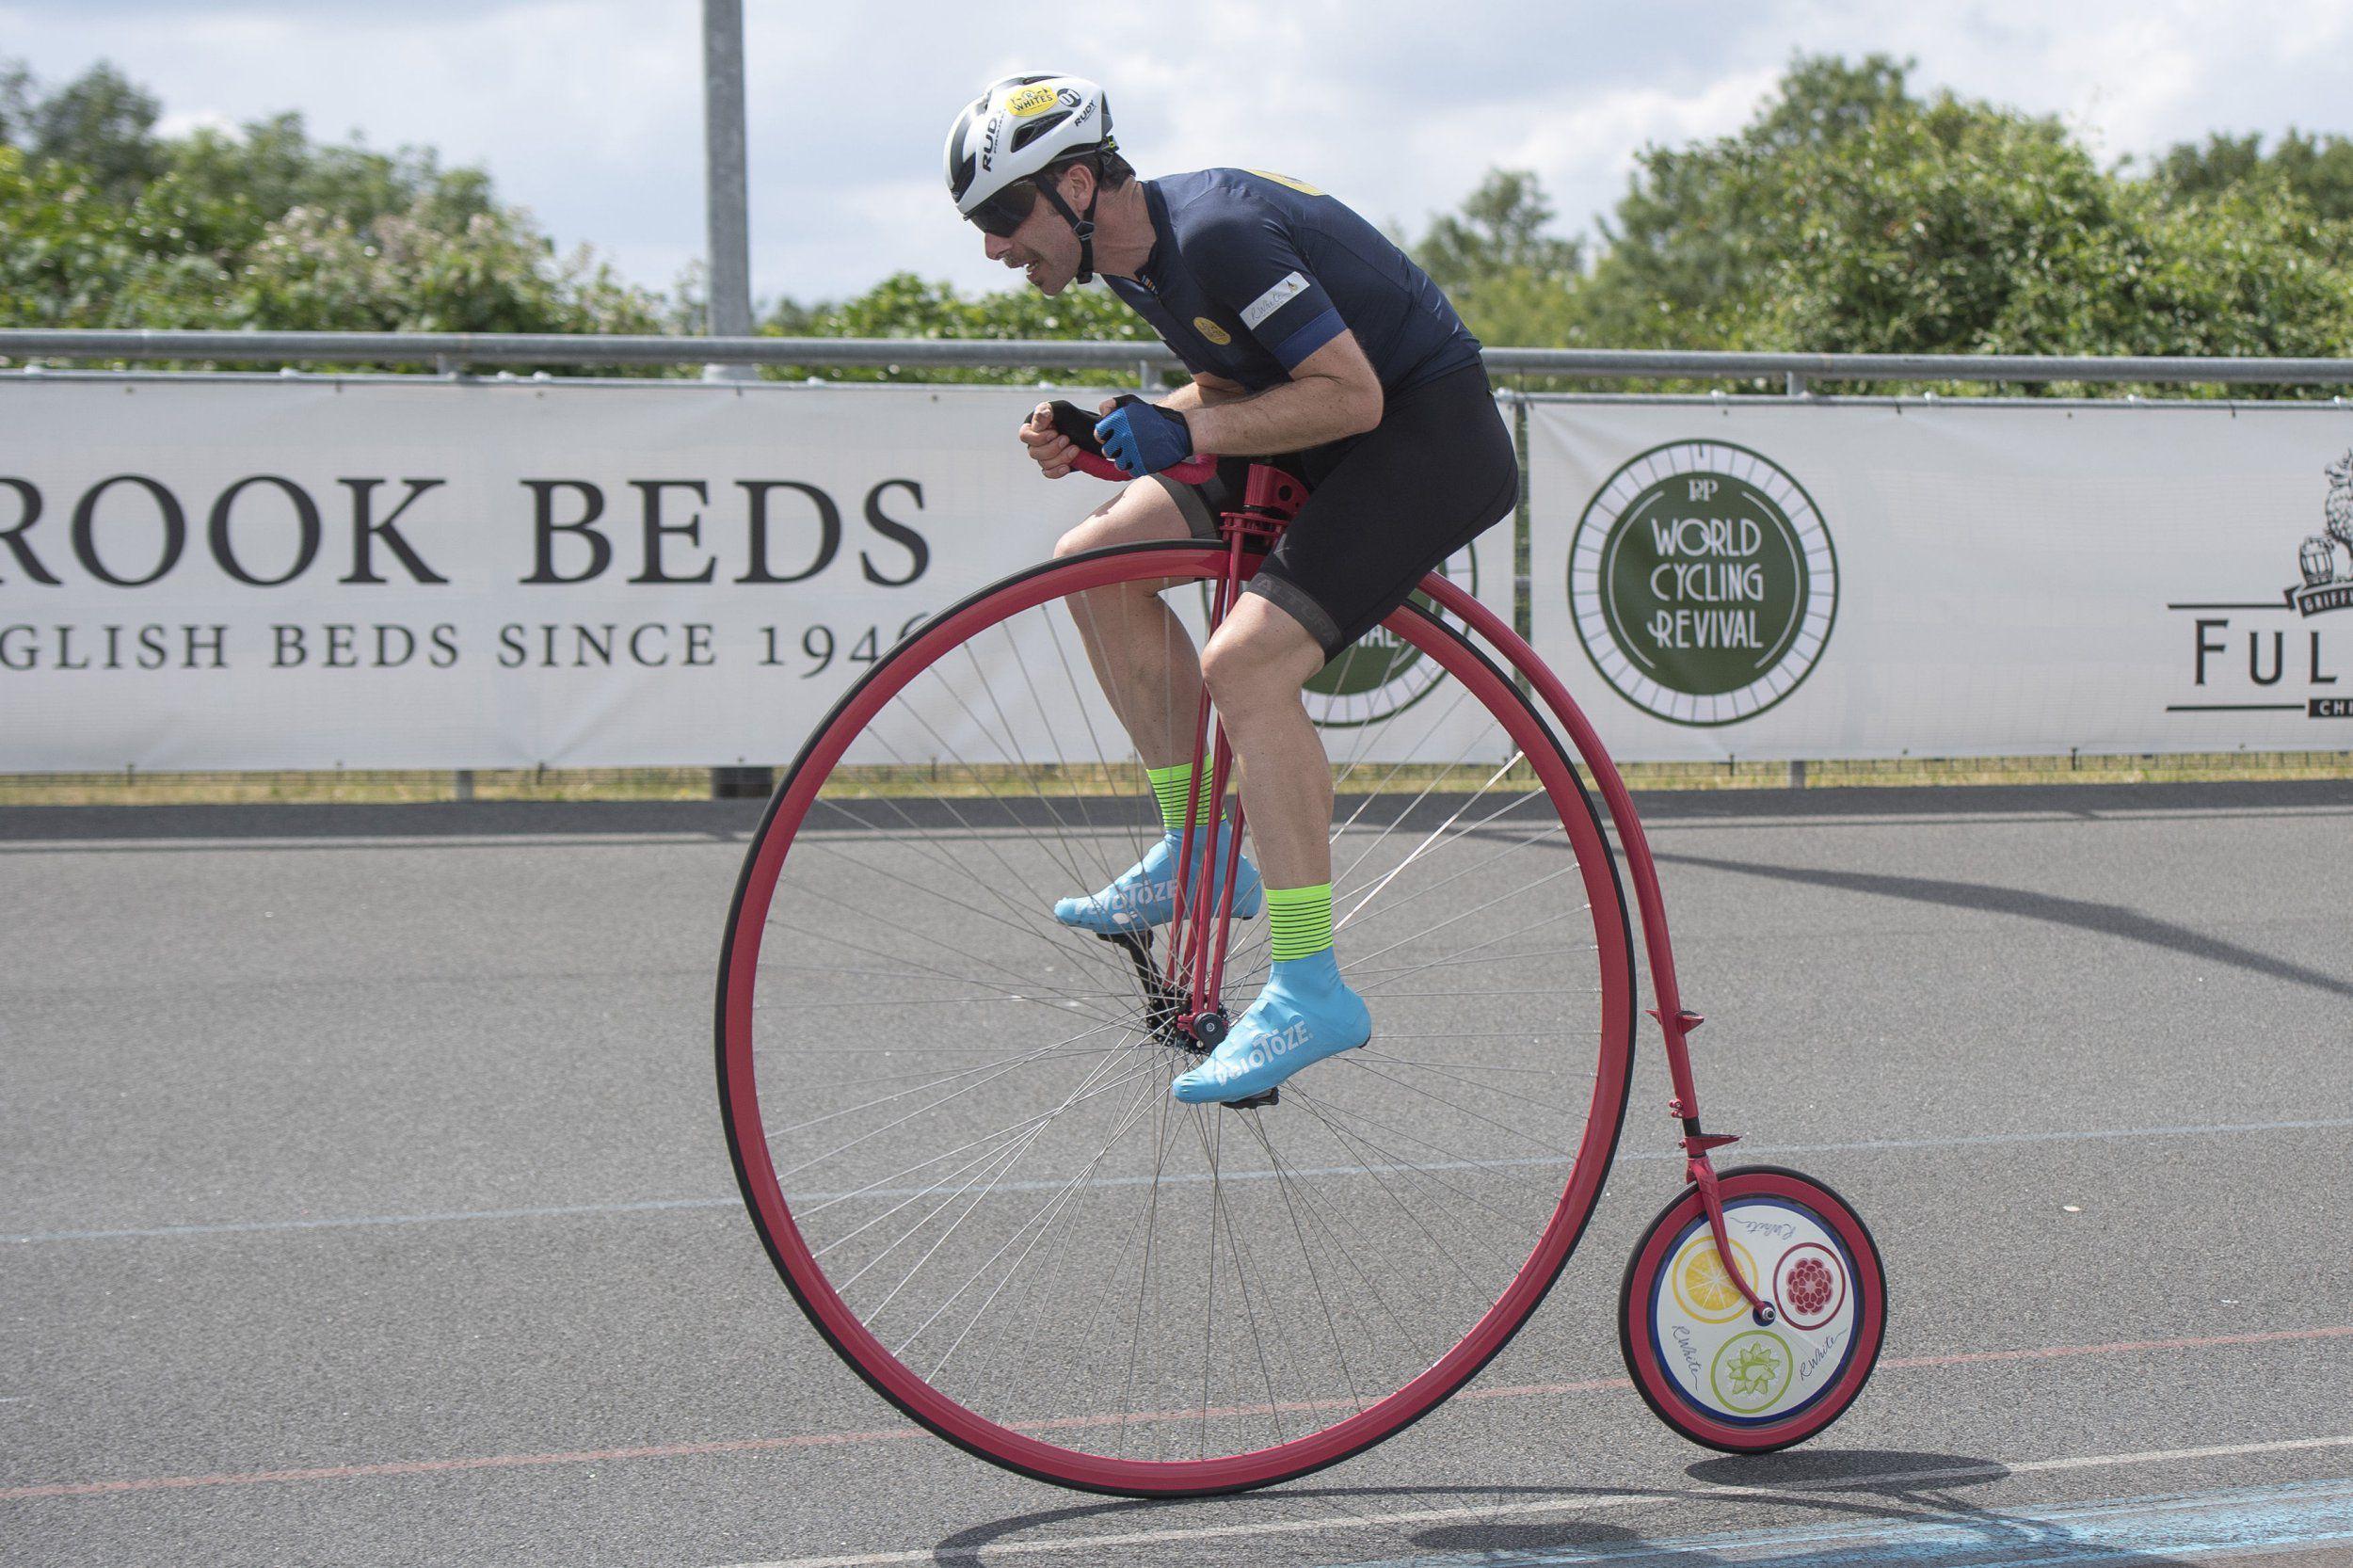 Sam Wakeling Rode 281.85 Miles in Under 24 Hours